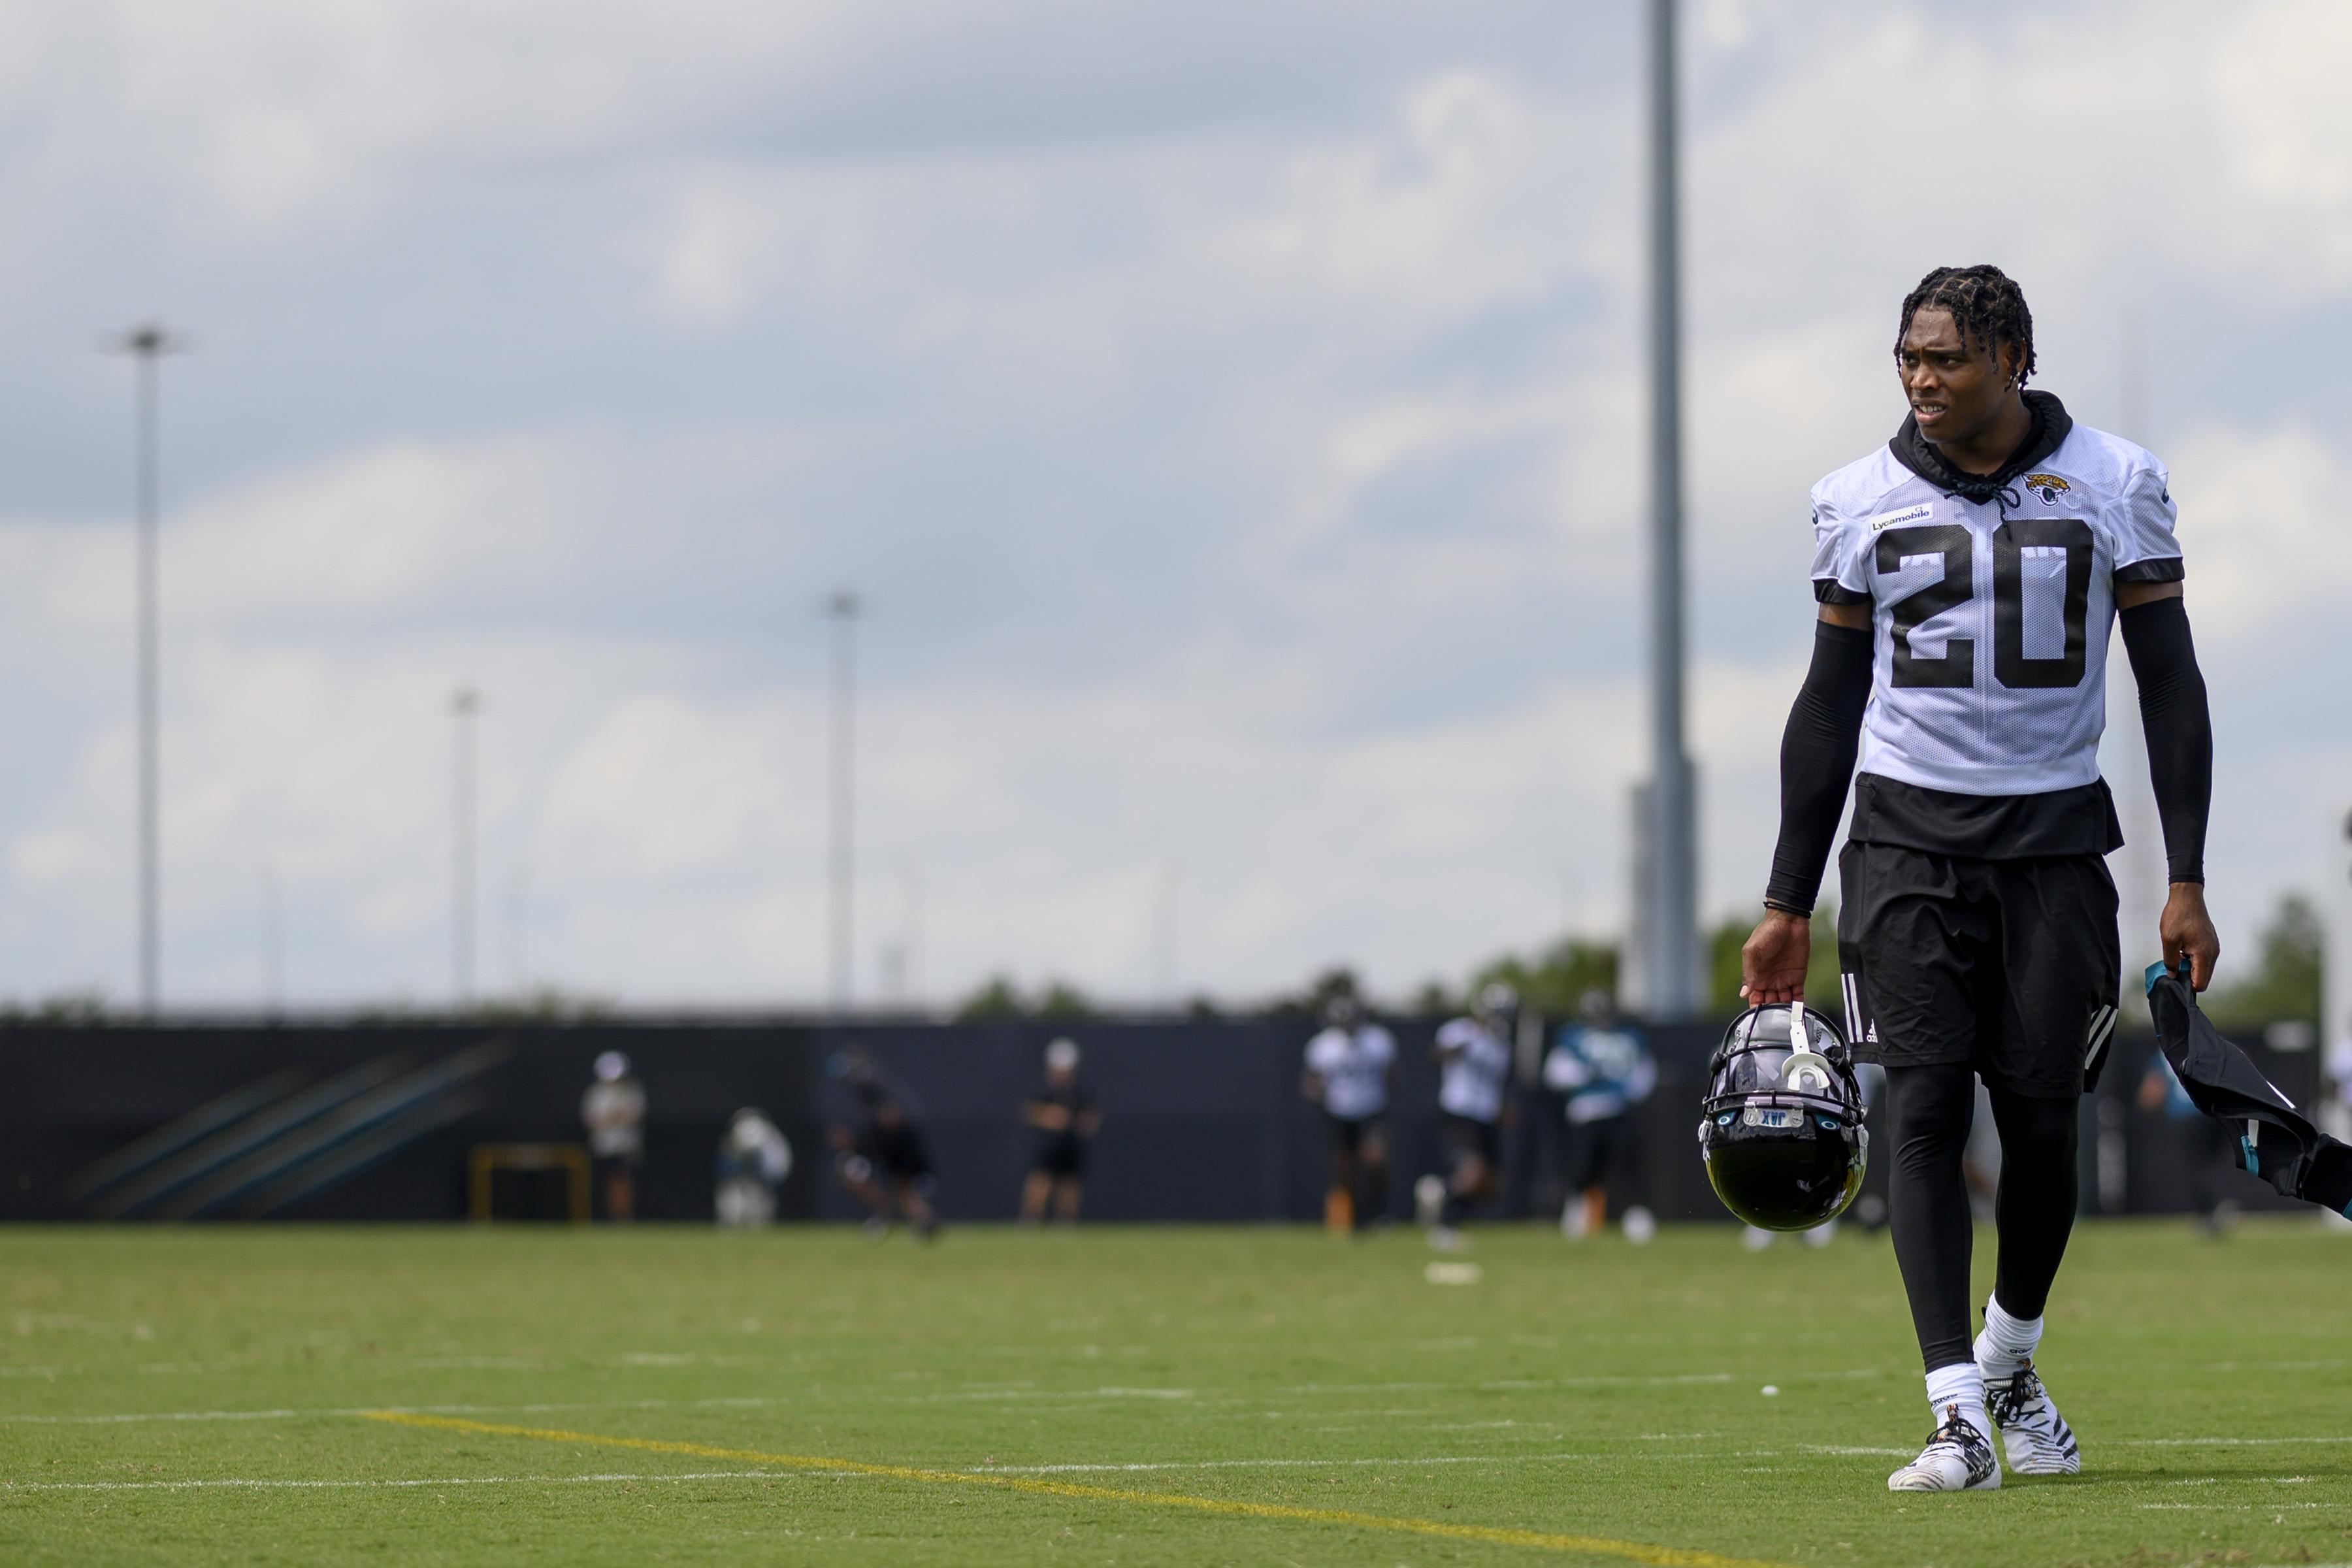 NFL: Jacksonville Jaguars-Training Camp